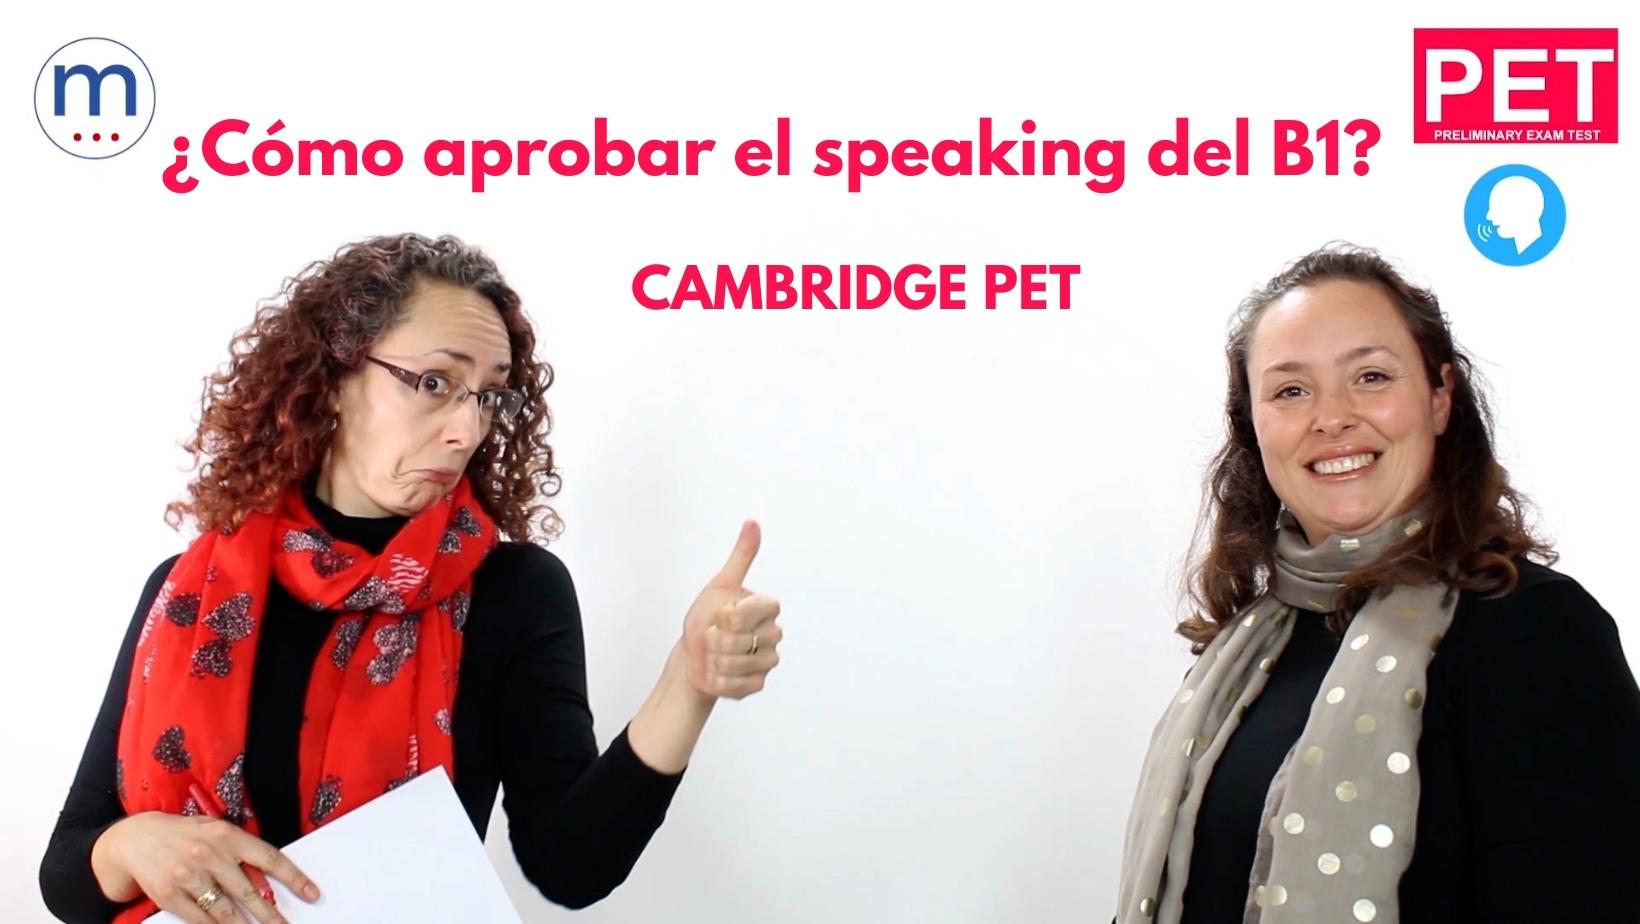 Preparar el speaking del B1 de inglés